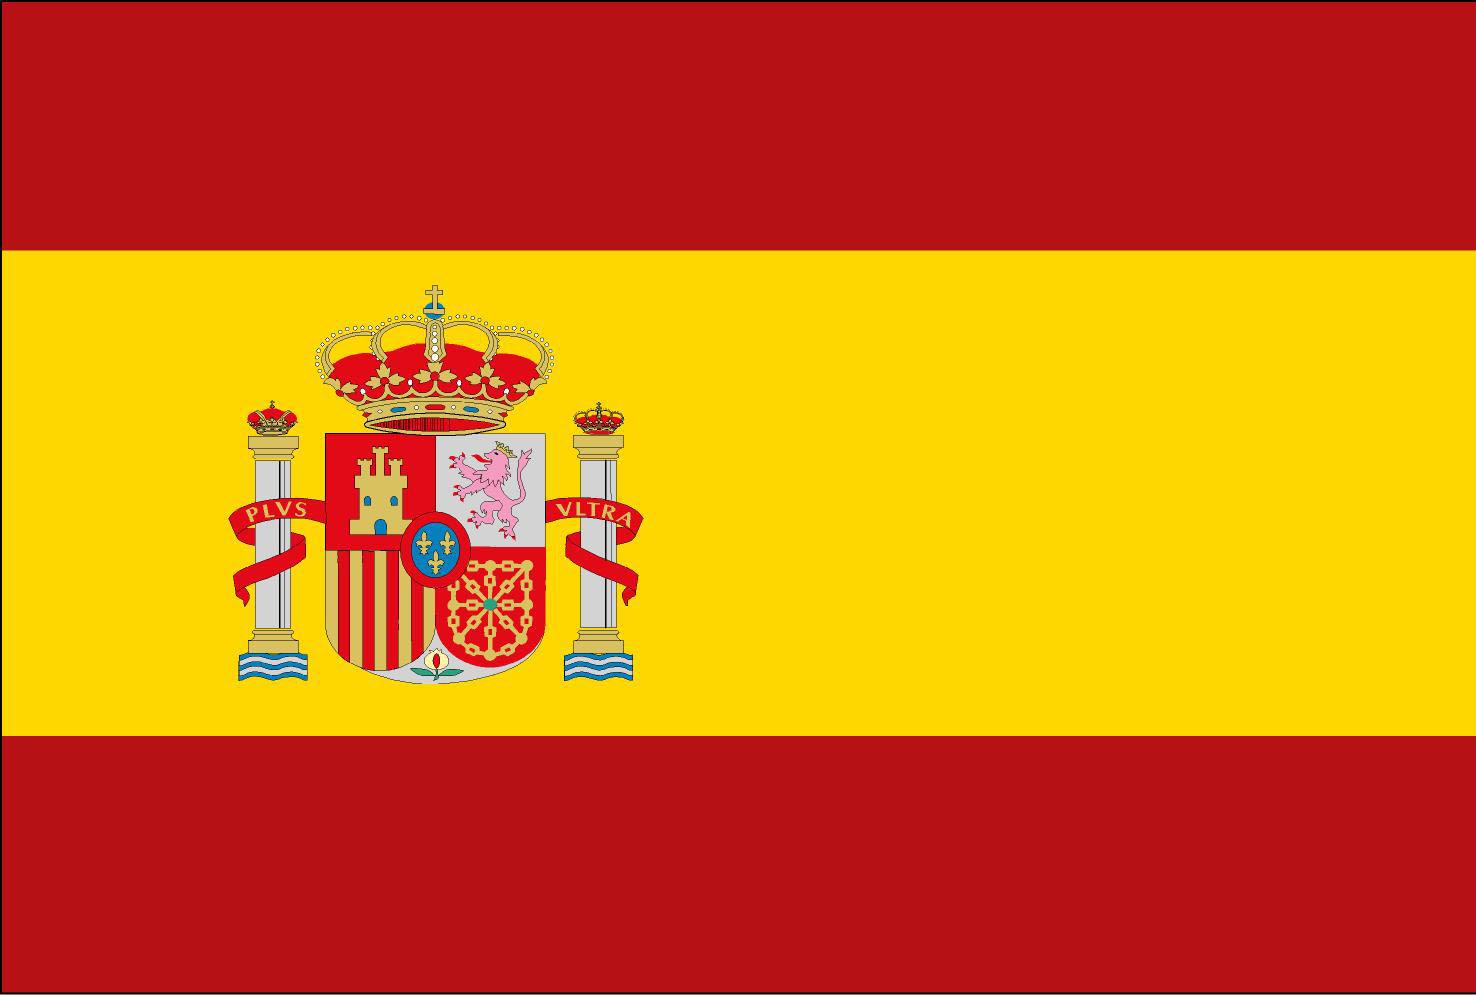 bandeiras da espanha 4.jpg